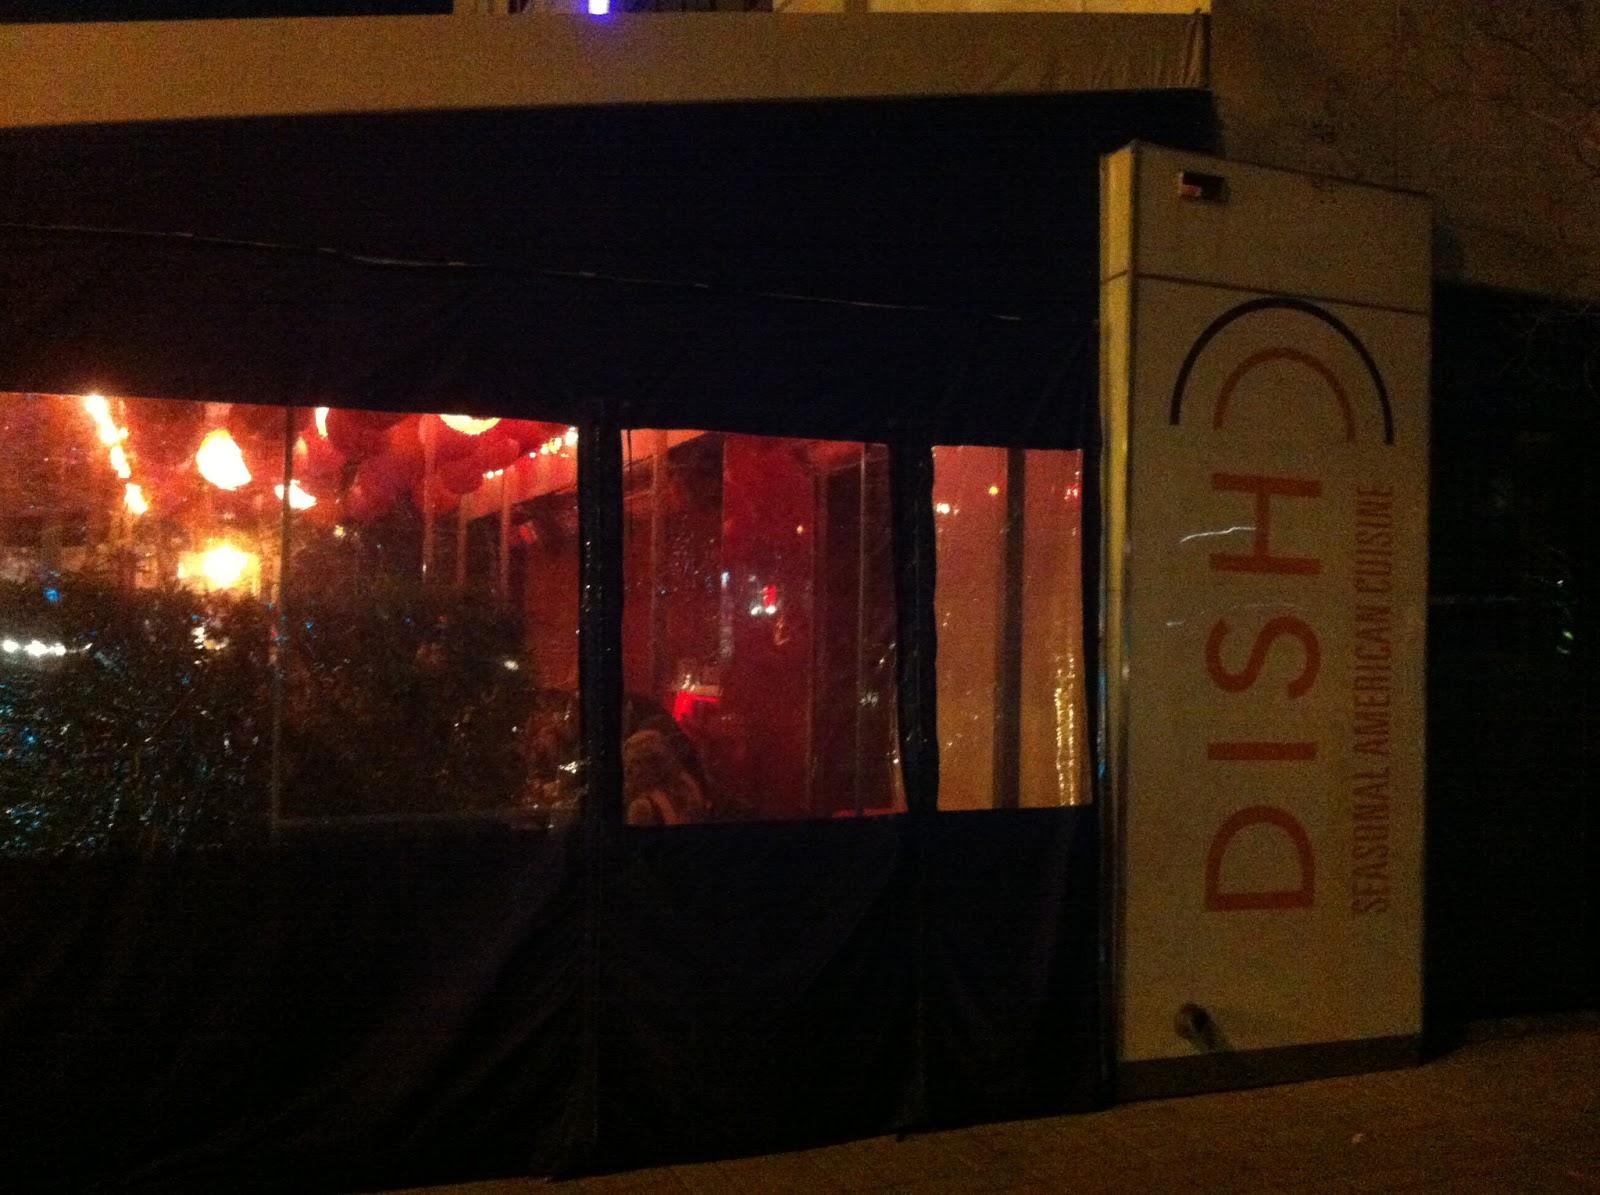 Dish Dallas Restaurant BBQ Barbecue Barbeque Bar-B-Que